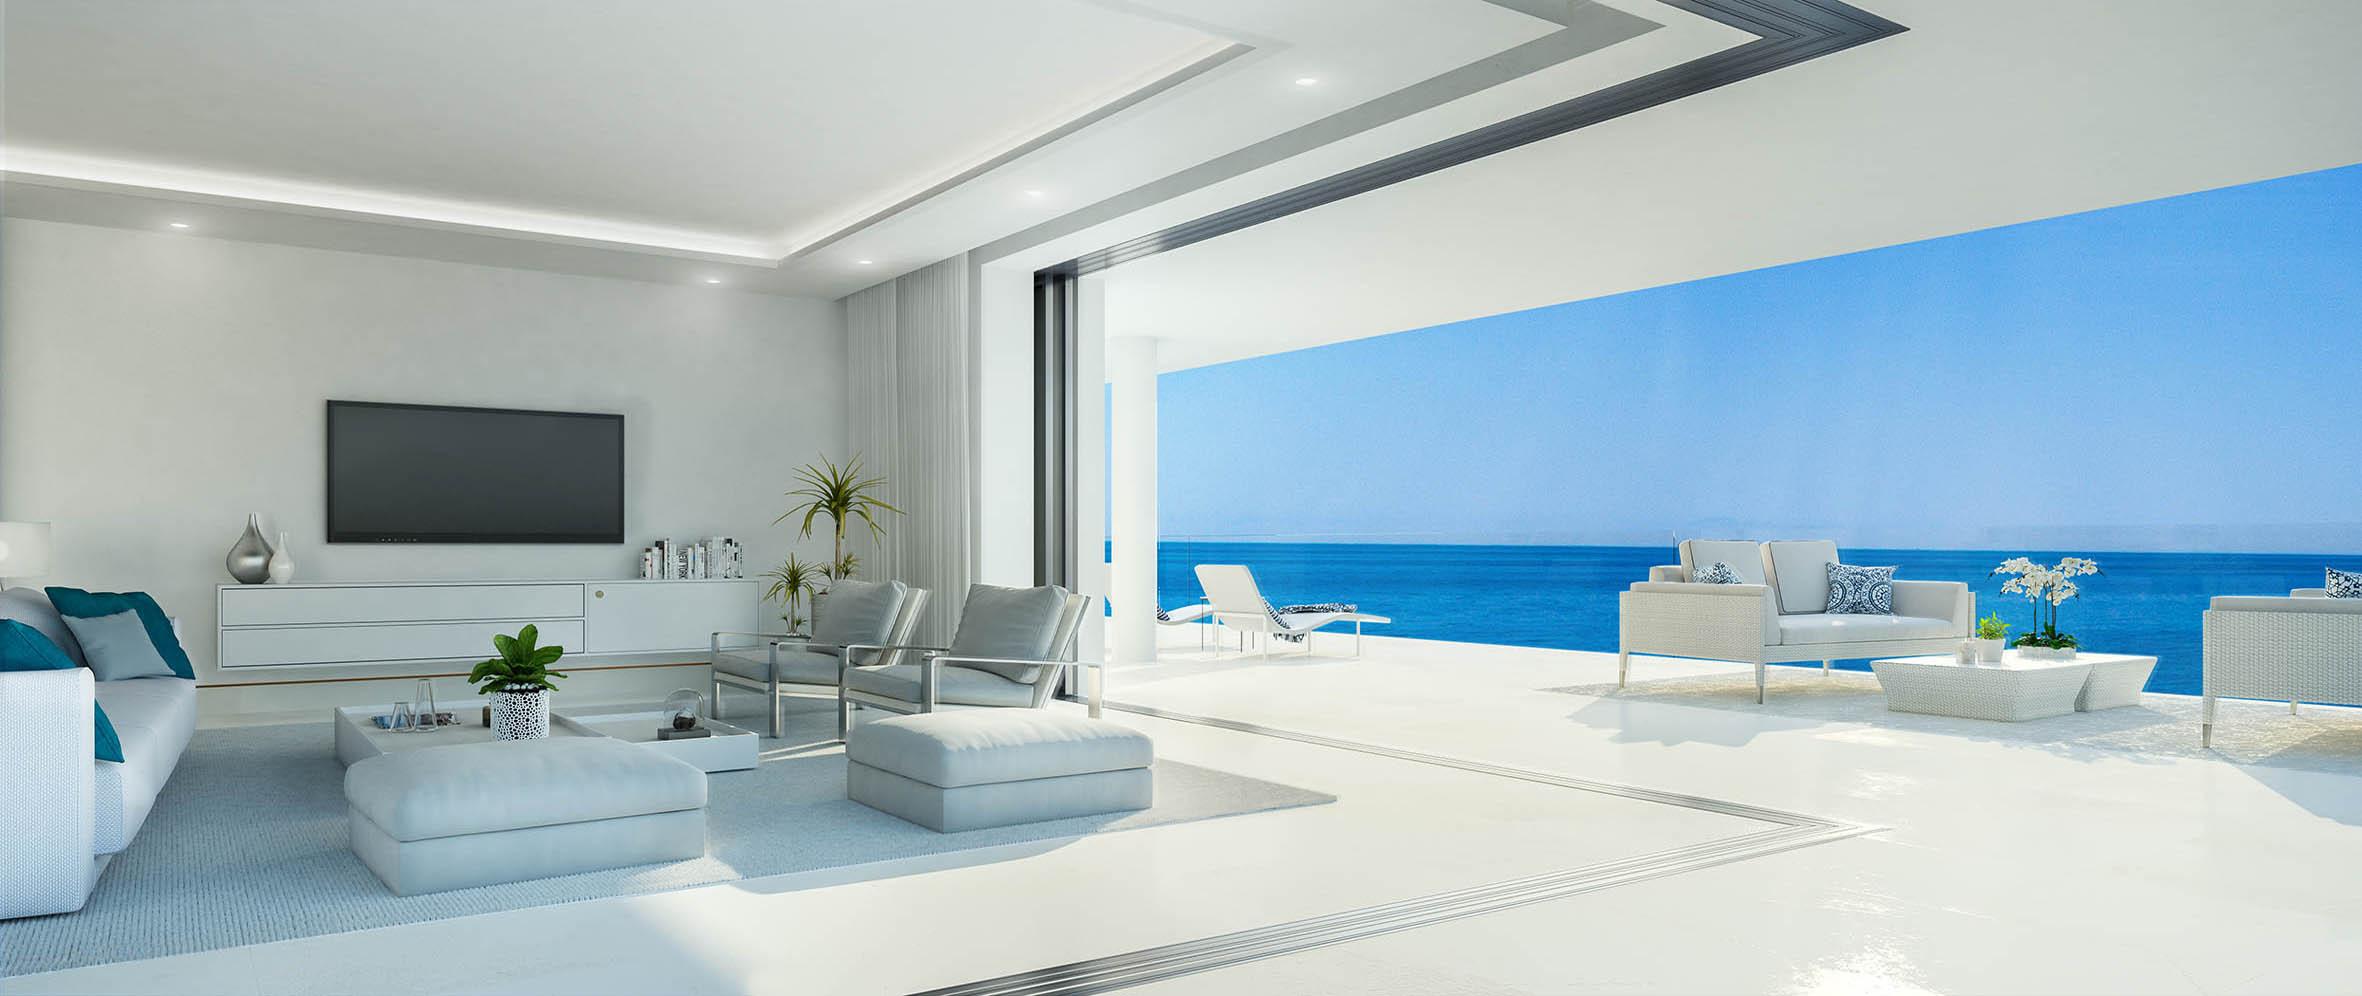 Gloocall - Cocoon Marbella - Estates & Rentals